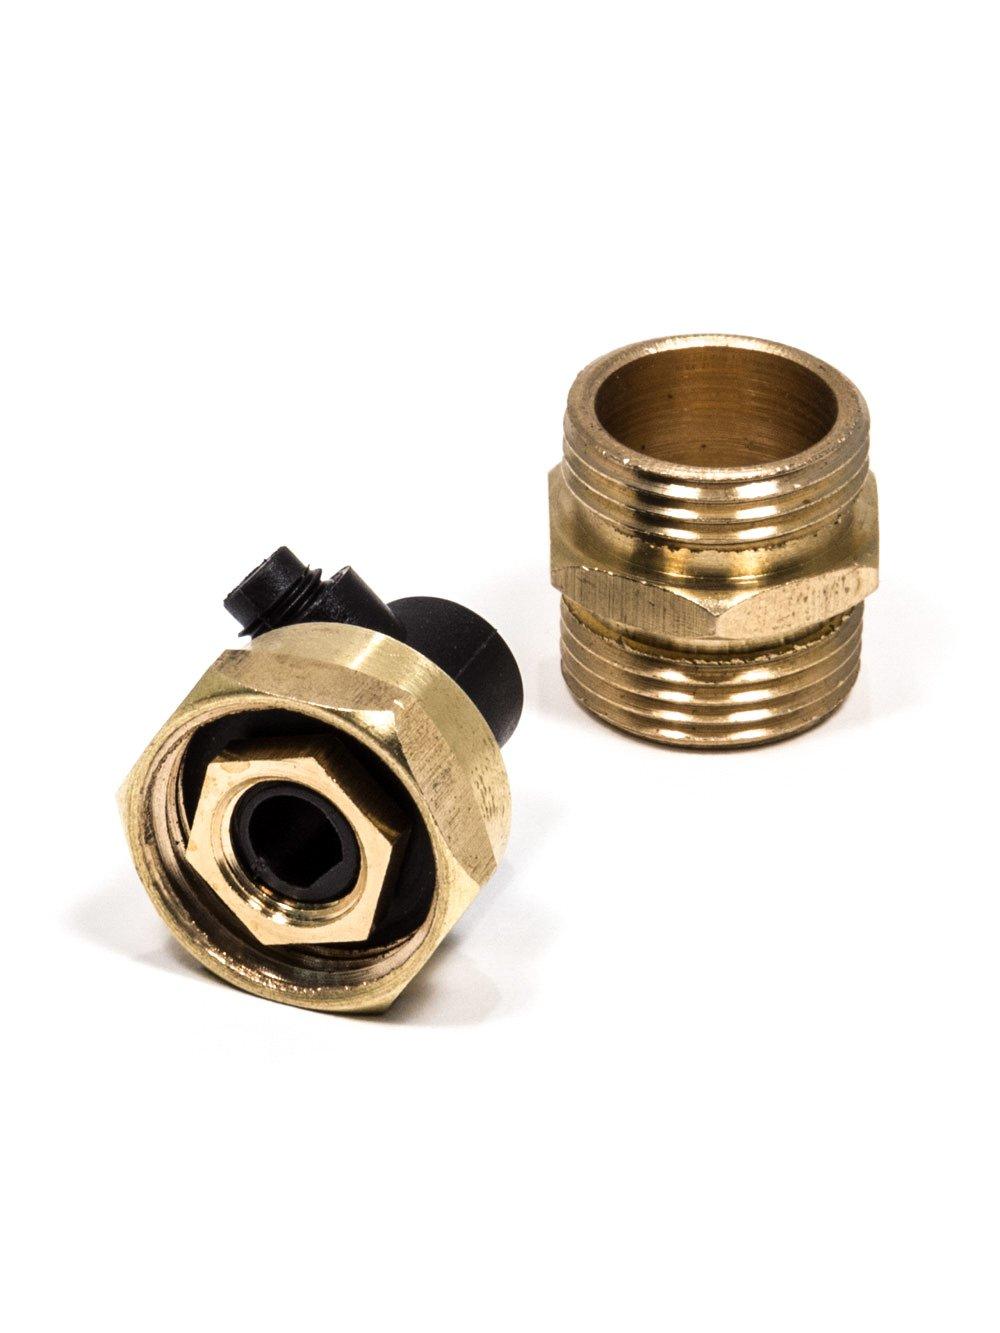 Brass Gland Conduit Cord Grip Fitting